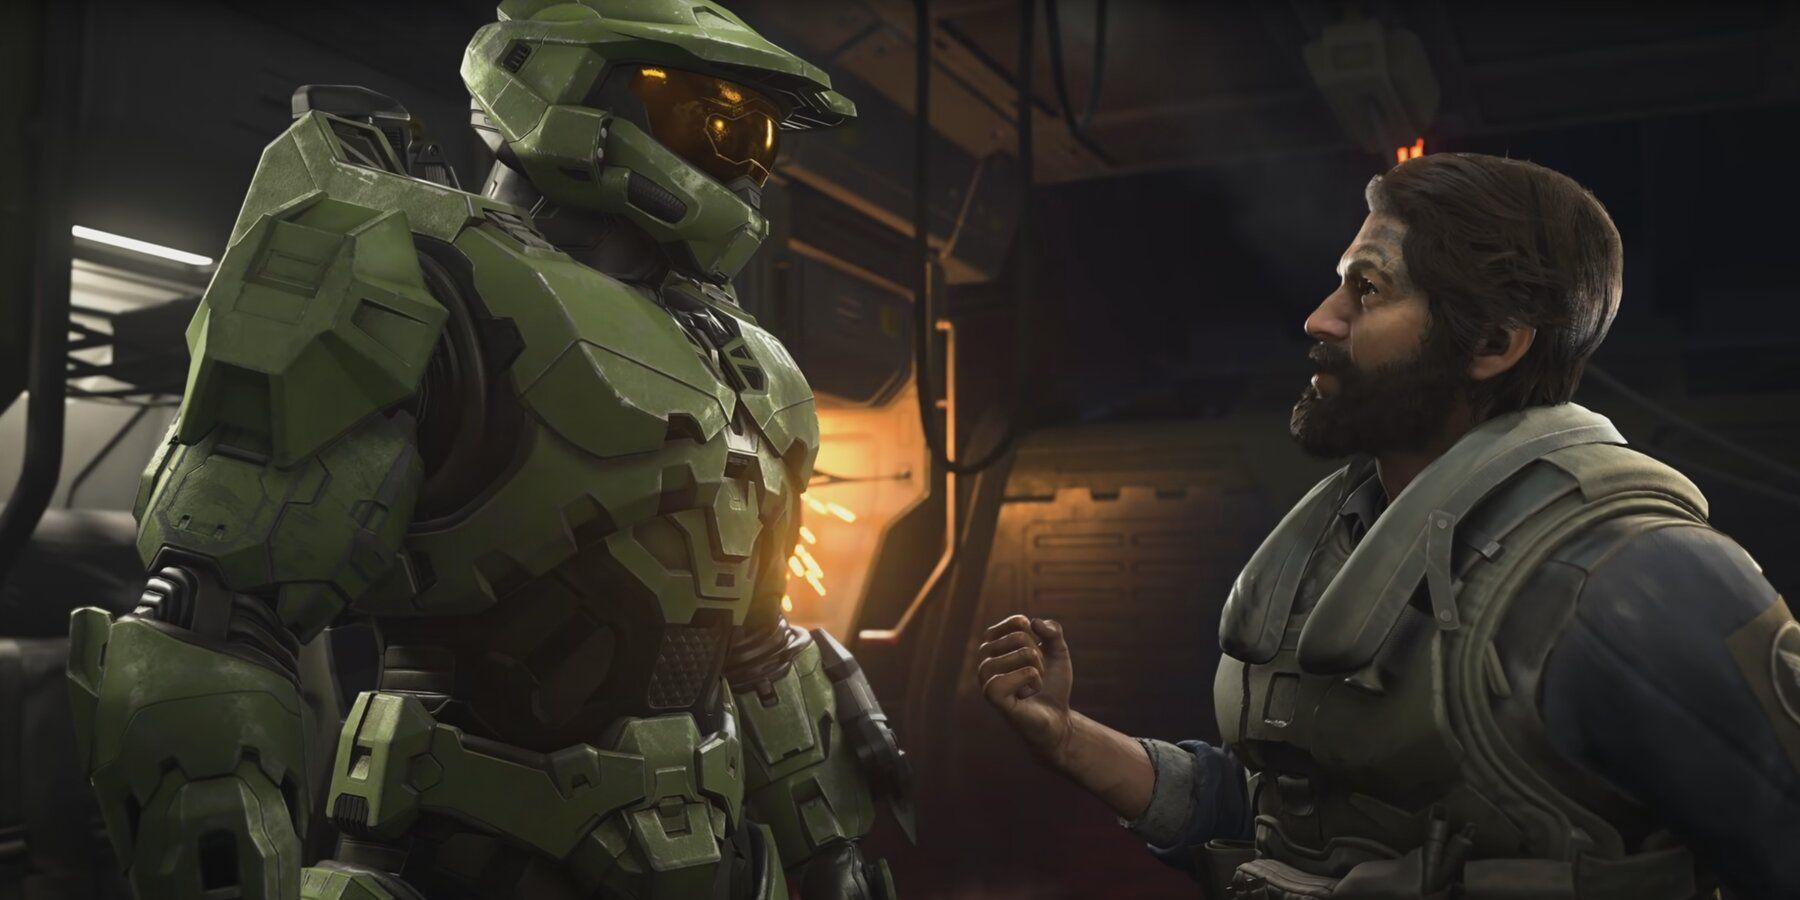 Halo Infinite: Why Are Spartans So Big? - GameRant